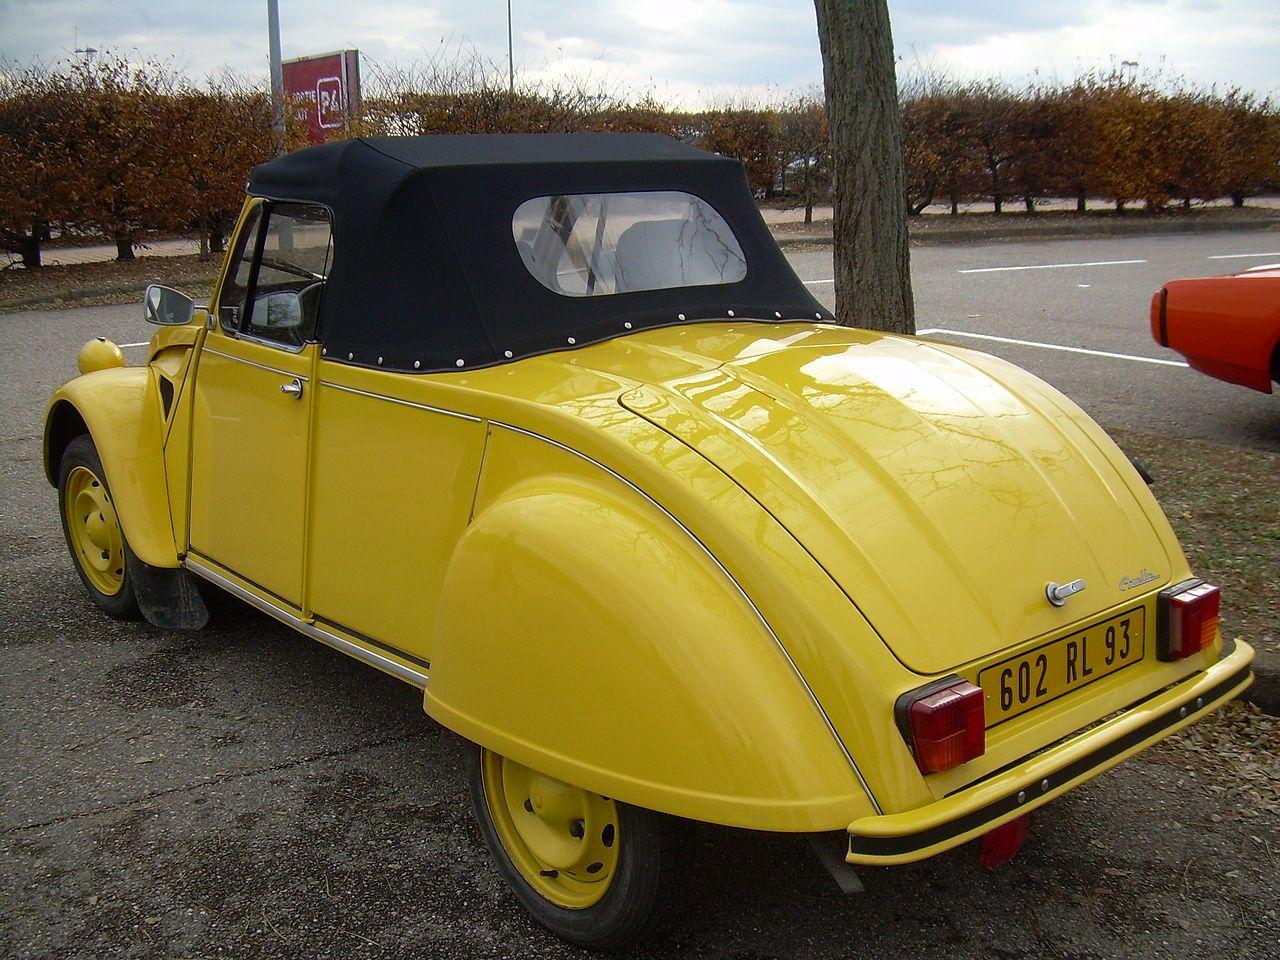 Citroen 2cv Citroen 2cv Citroen Yellow Car